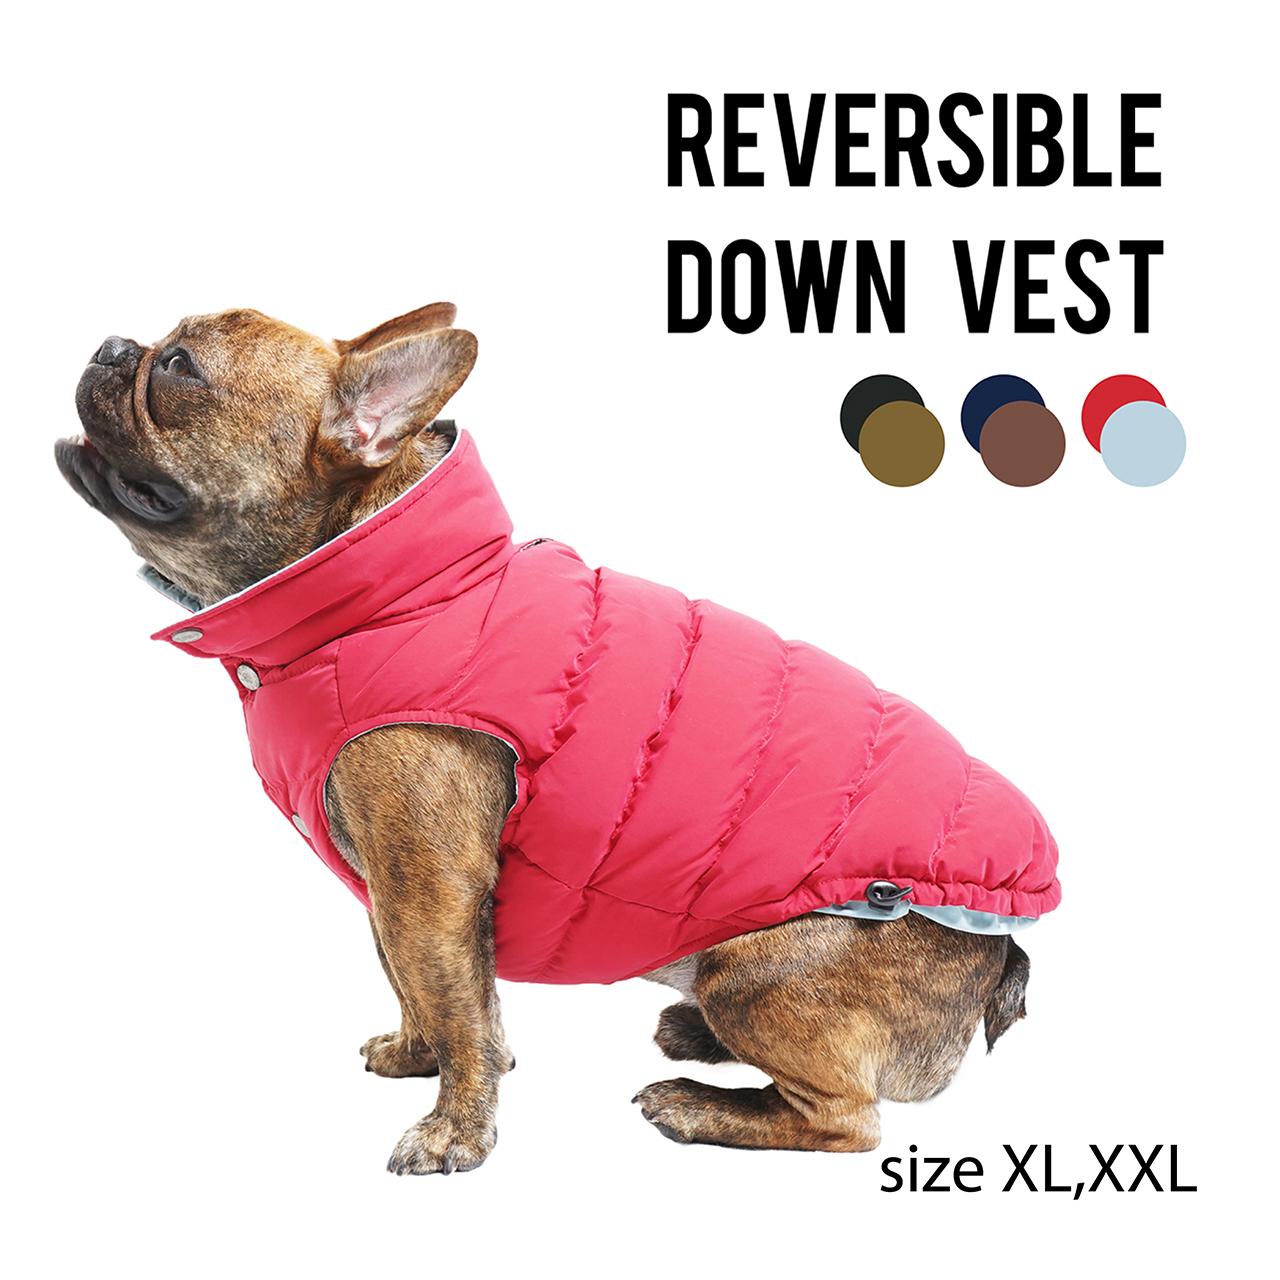 REVERSIBLE DOWN VEST(XL,XXL) リバーシブルダウンベスト